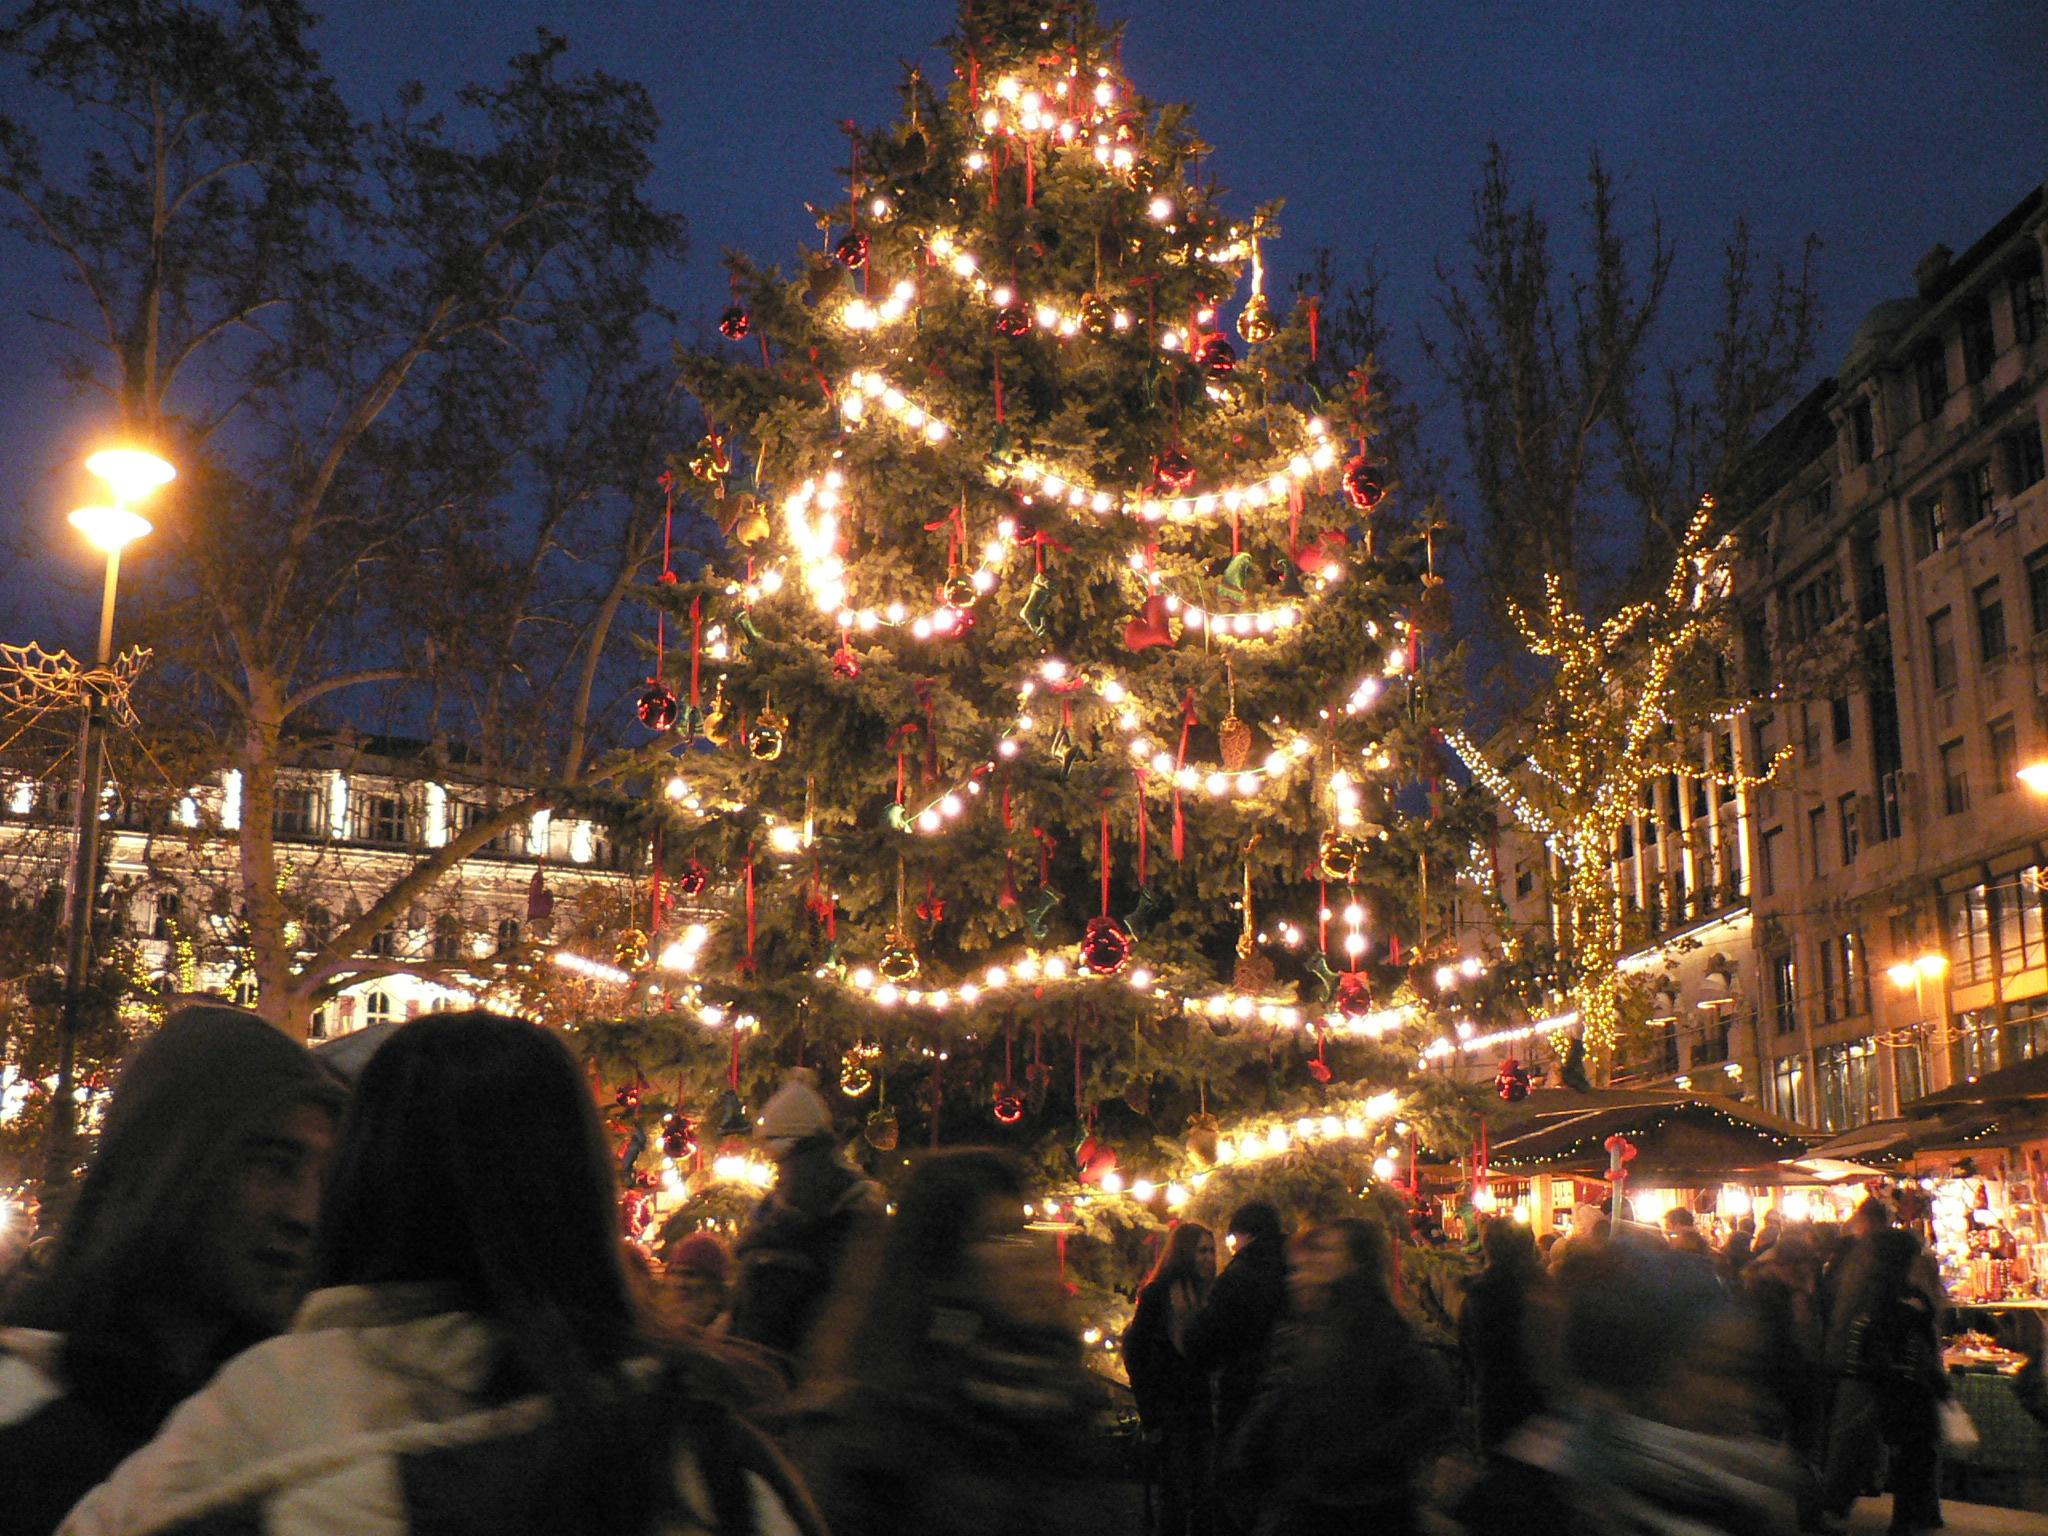 filechristmas market budapestjpg - Christmas Market Dc